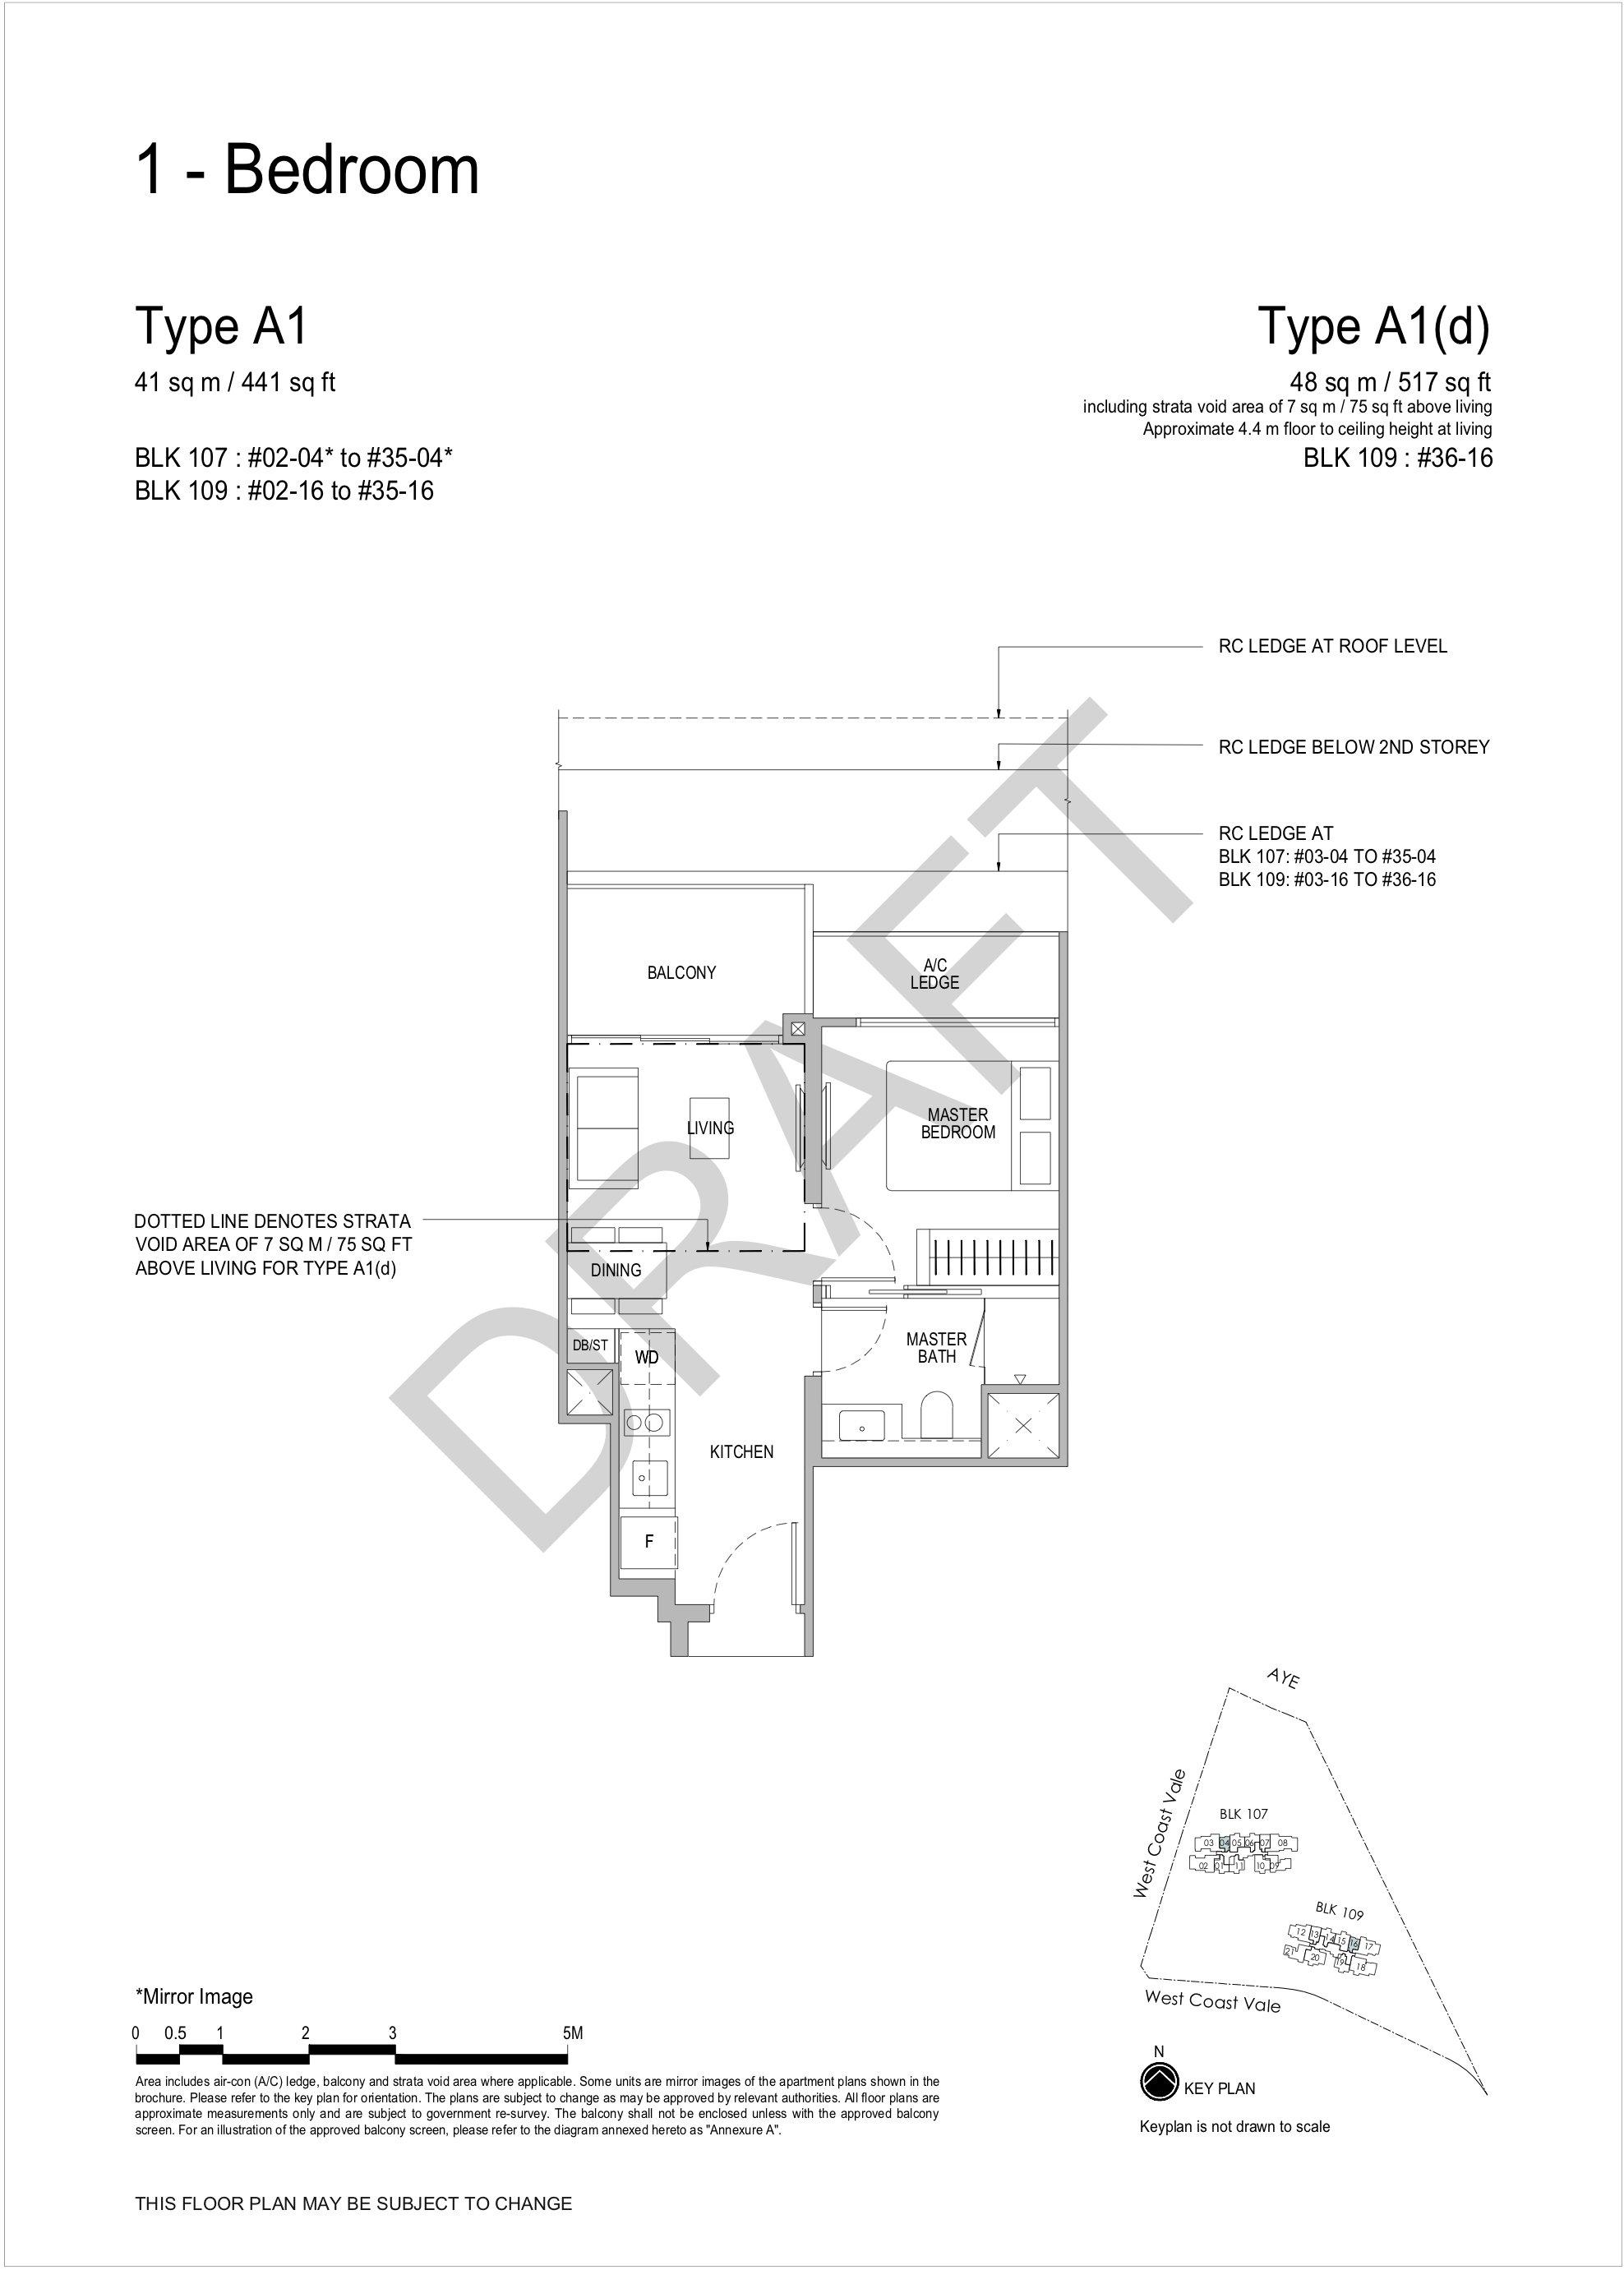 Whistler Grand 1 bedroom floor plan A1